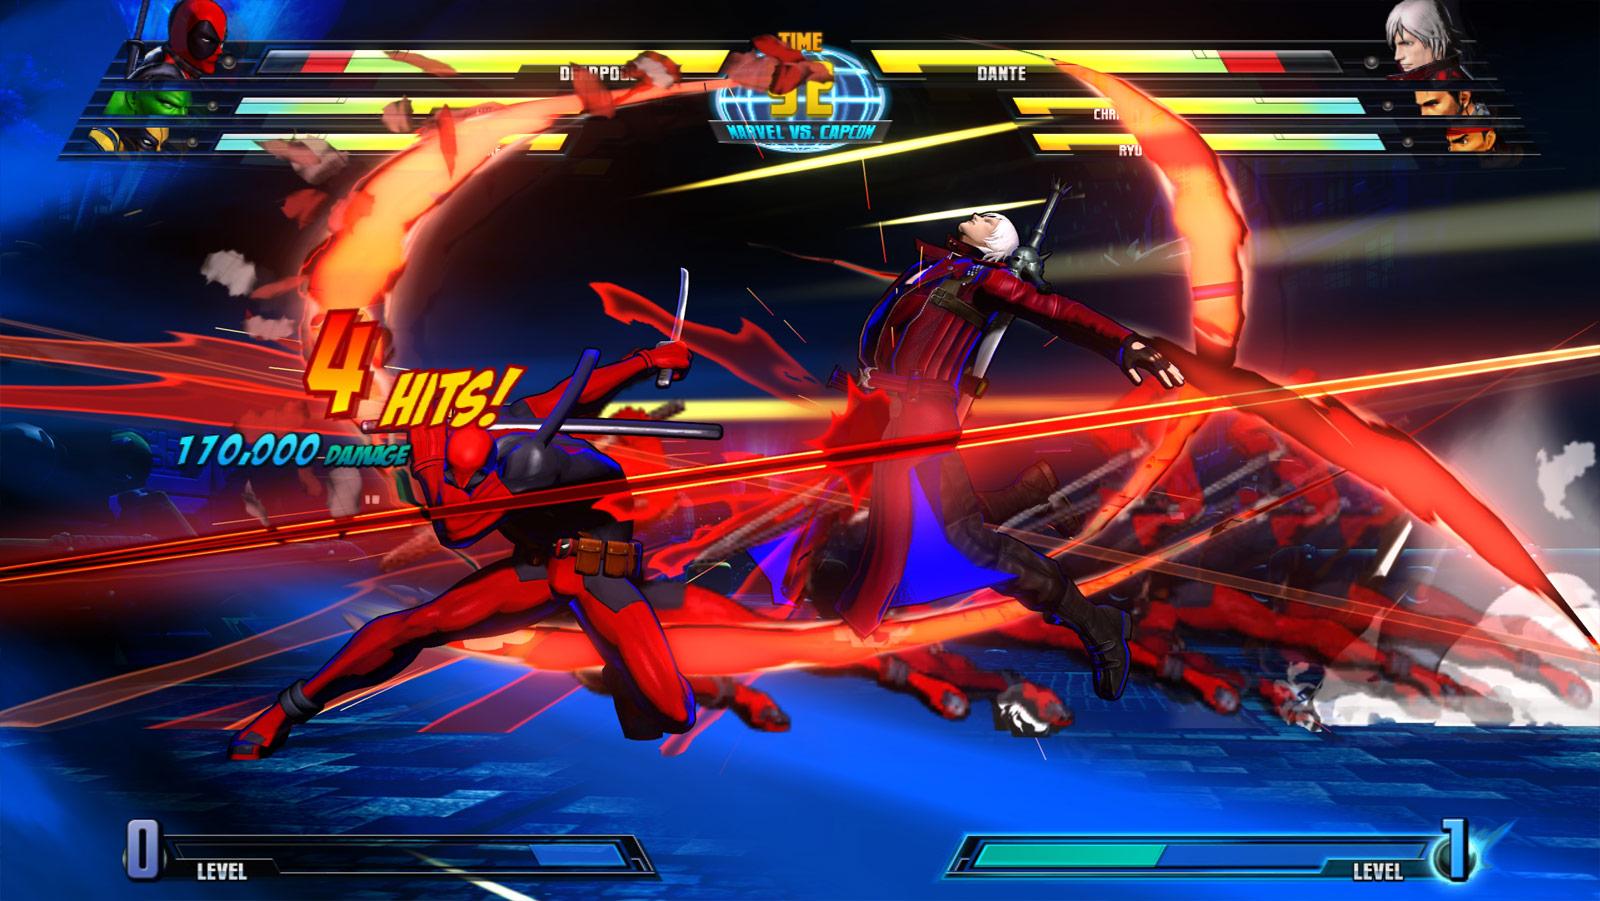 Marvel vs. Capcom 3 screen shot from E3 image #9